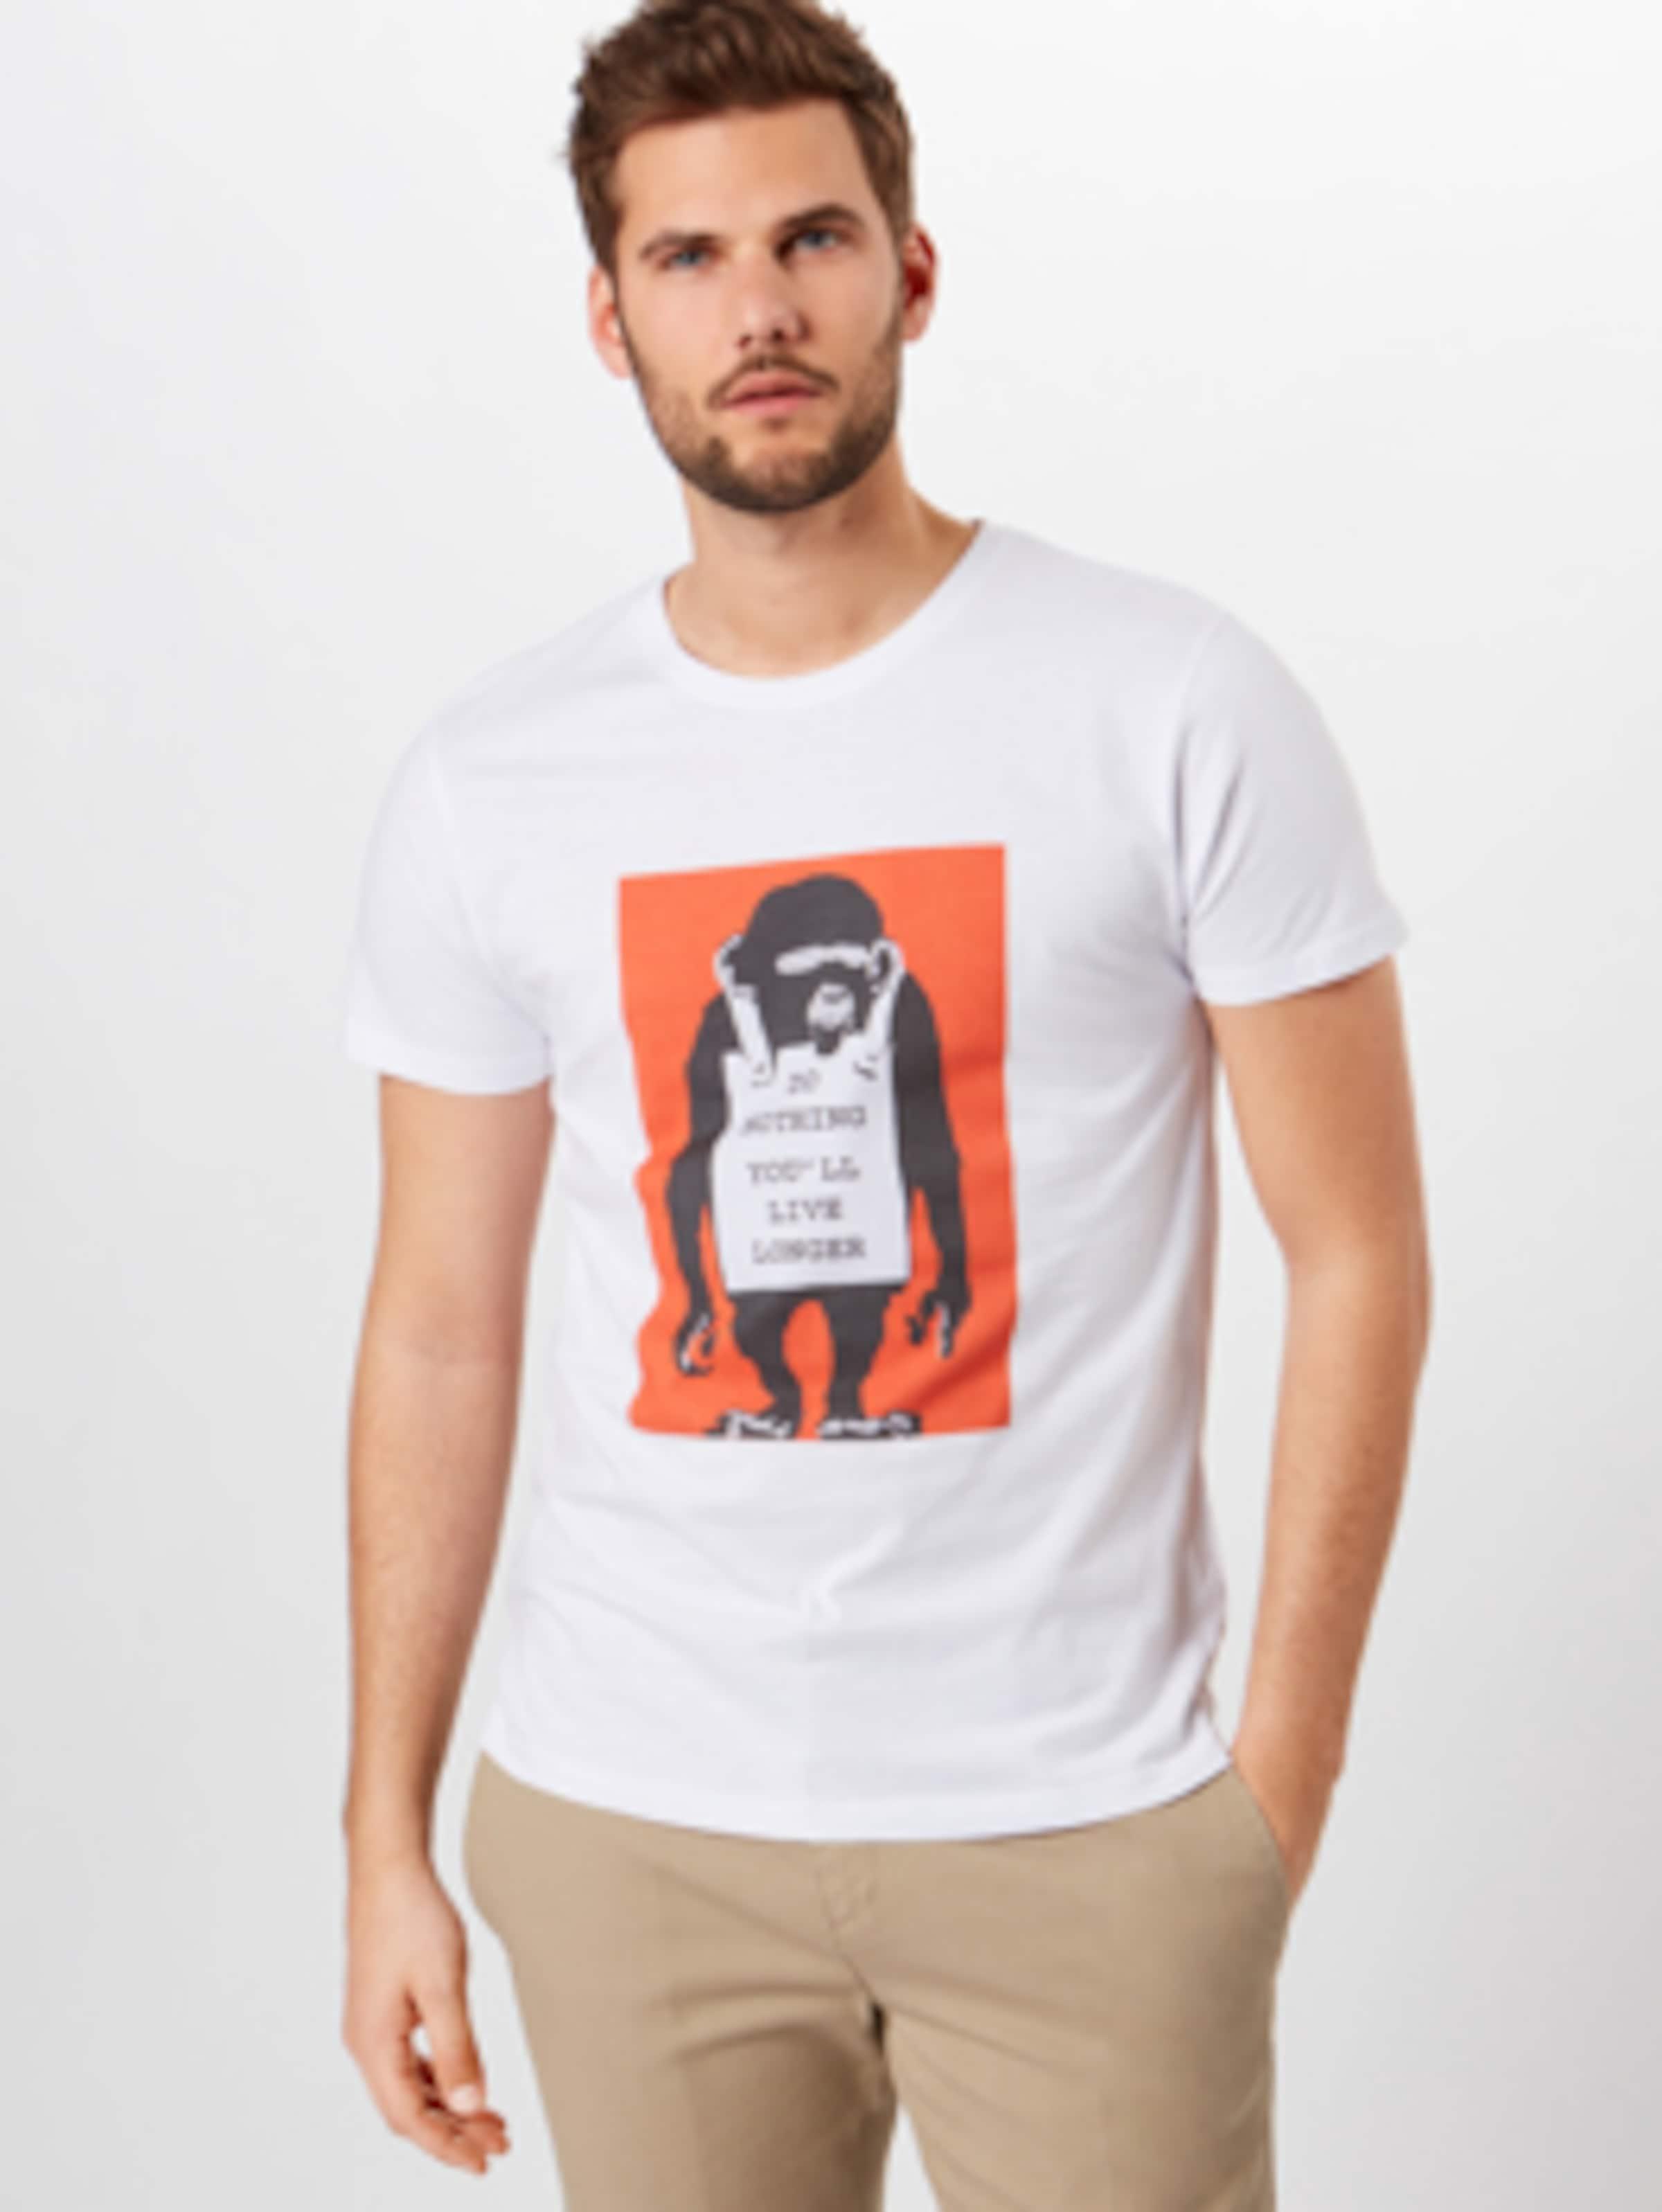 Mister shirt En Blanc OrangeNoir T Tee 2IE9DH